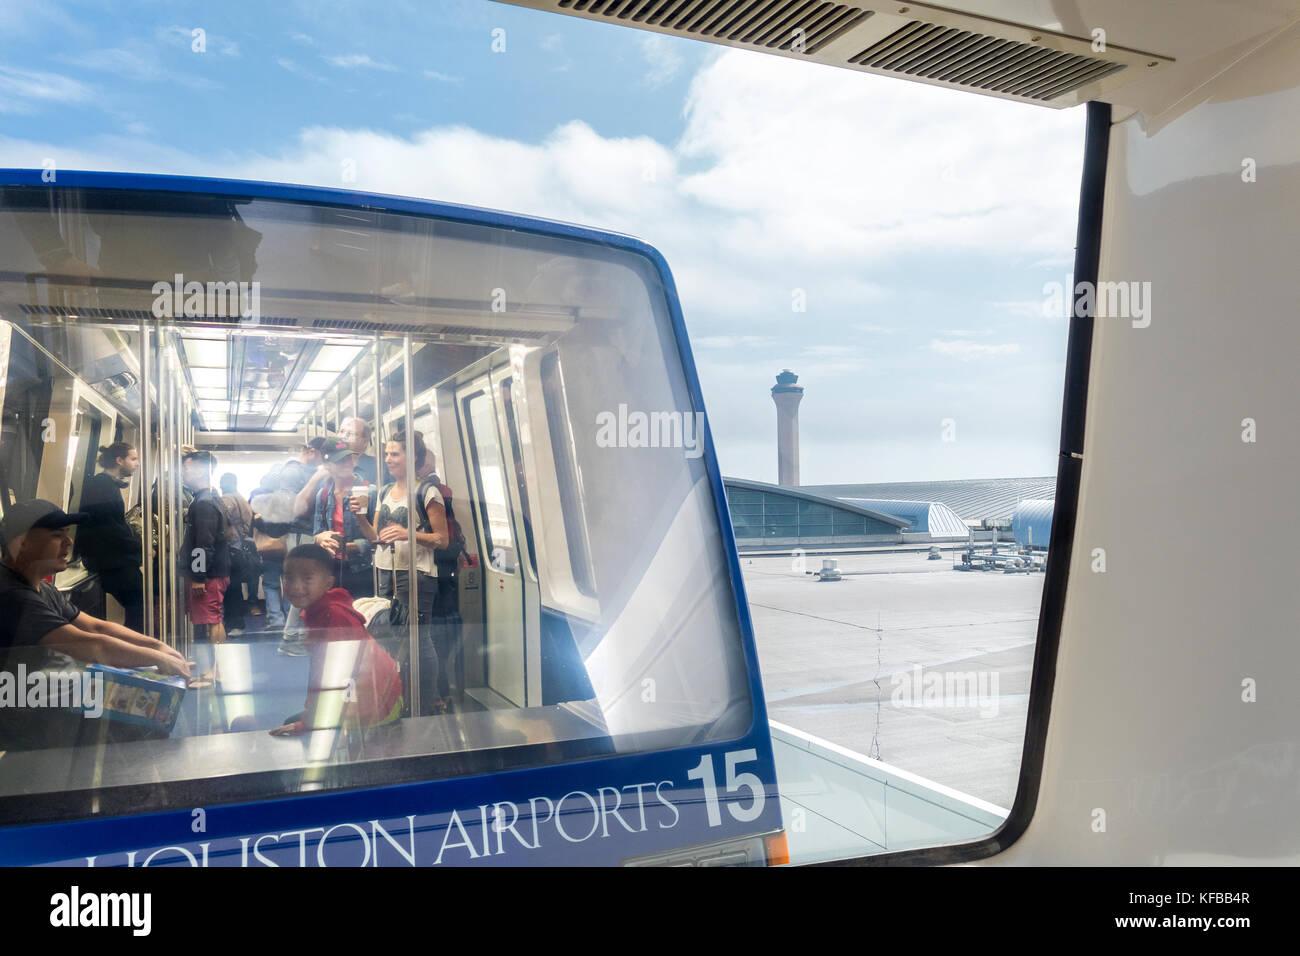 https://c7.alamy.com/comp/KFBB4R/houston-george-bush-intercontinental-airport-people-mover-train-and-KFBB4R.jpg